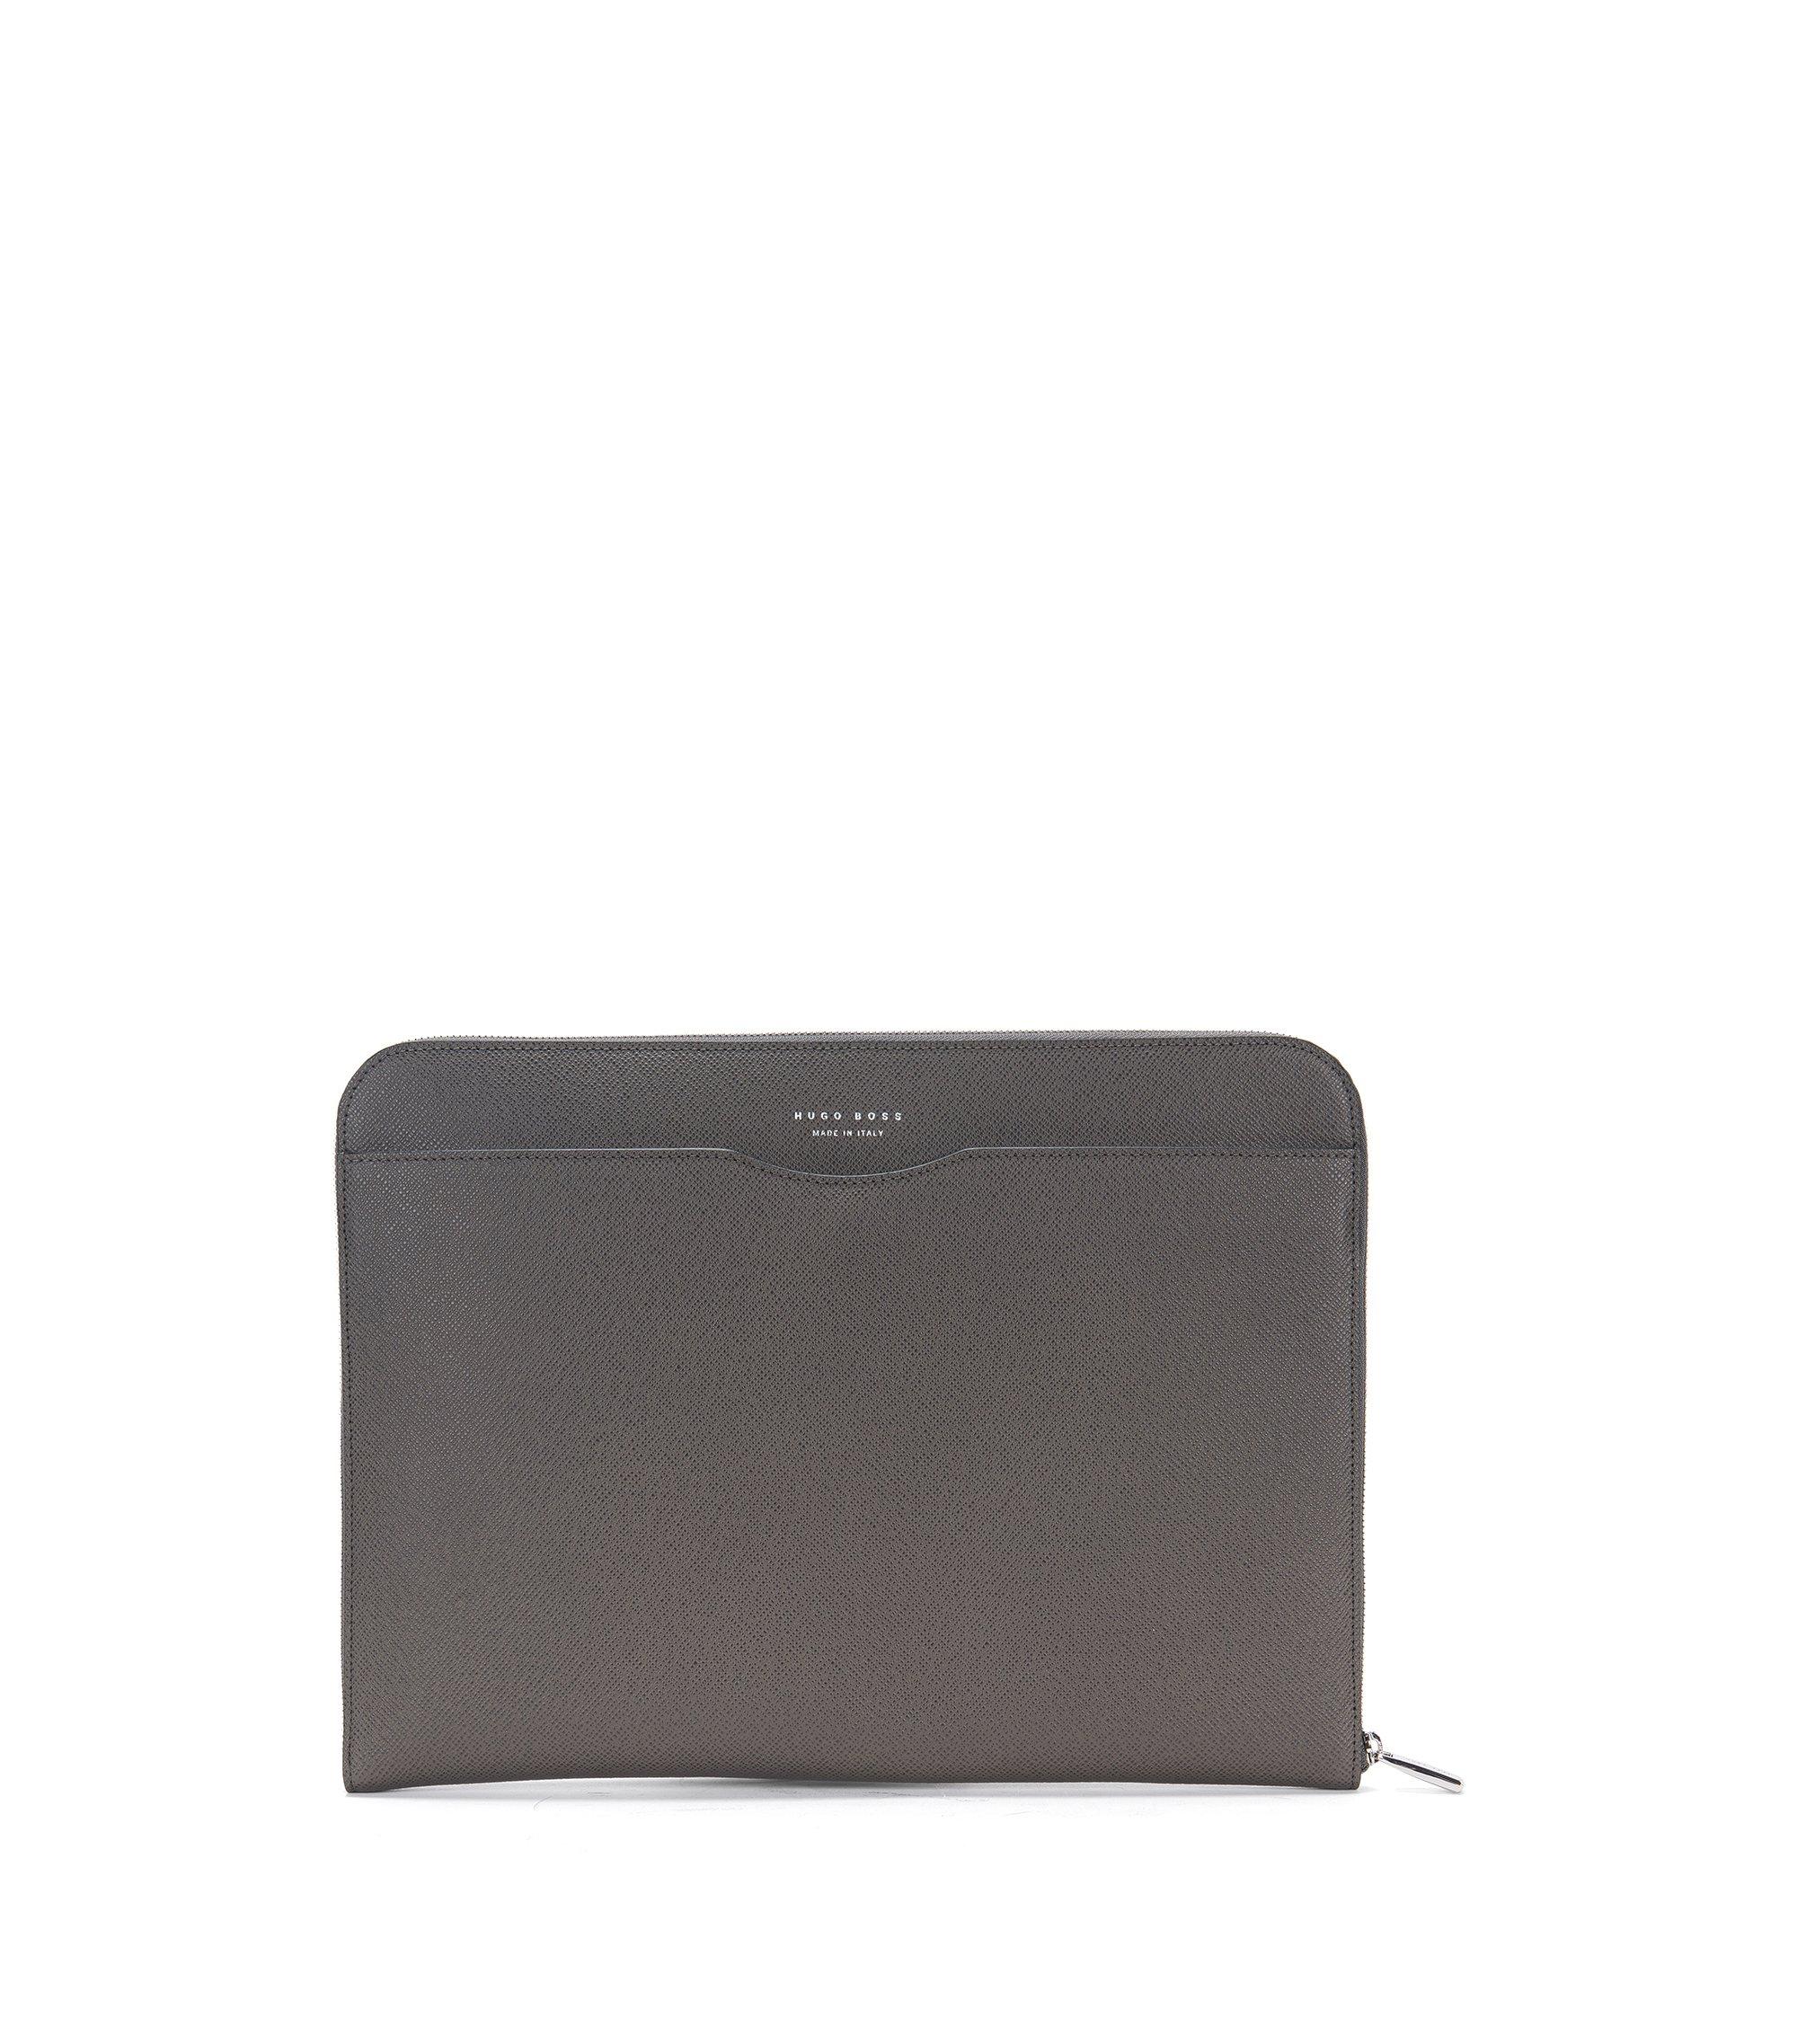 Porte-document de la collection Signature en cuir palmellato, Gris sombre